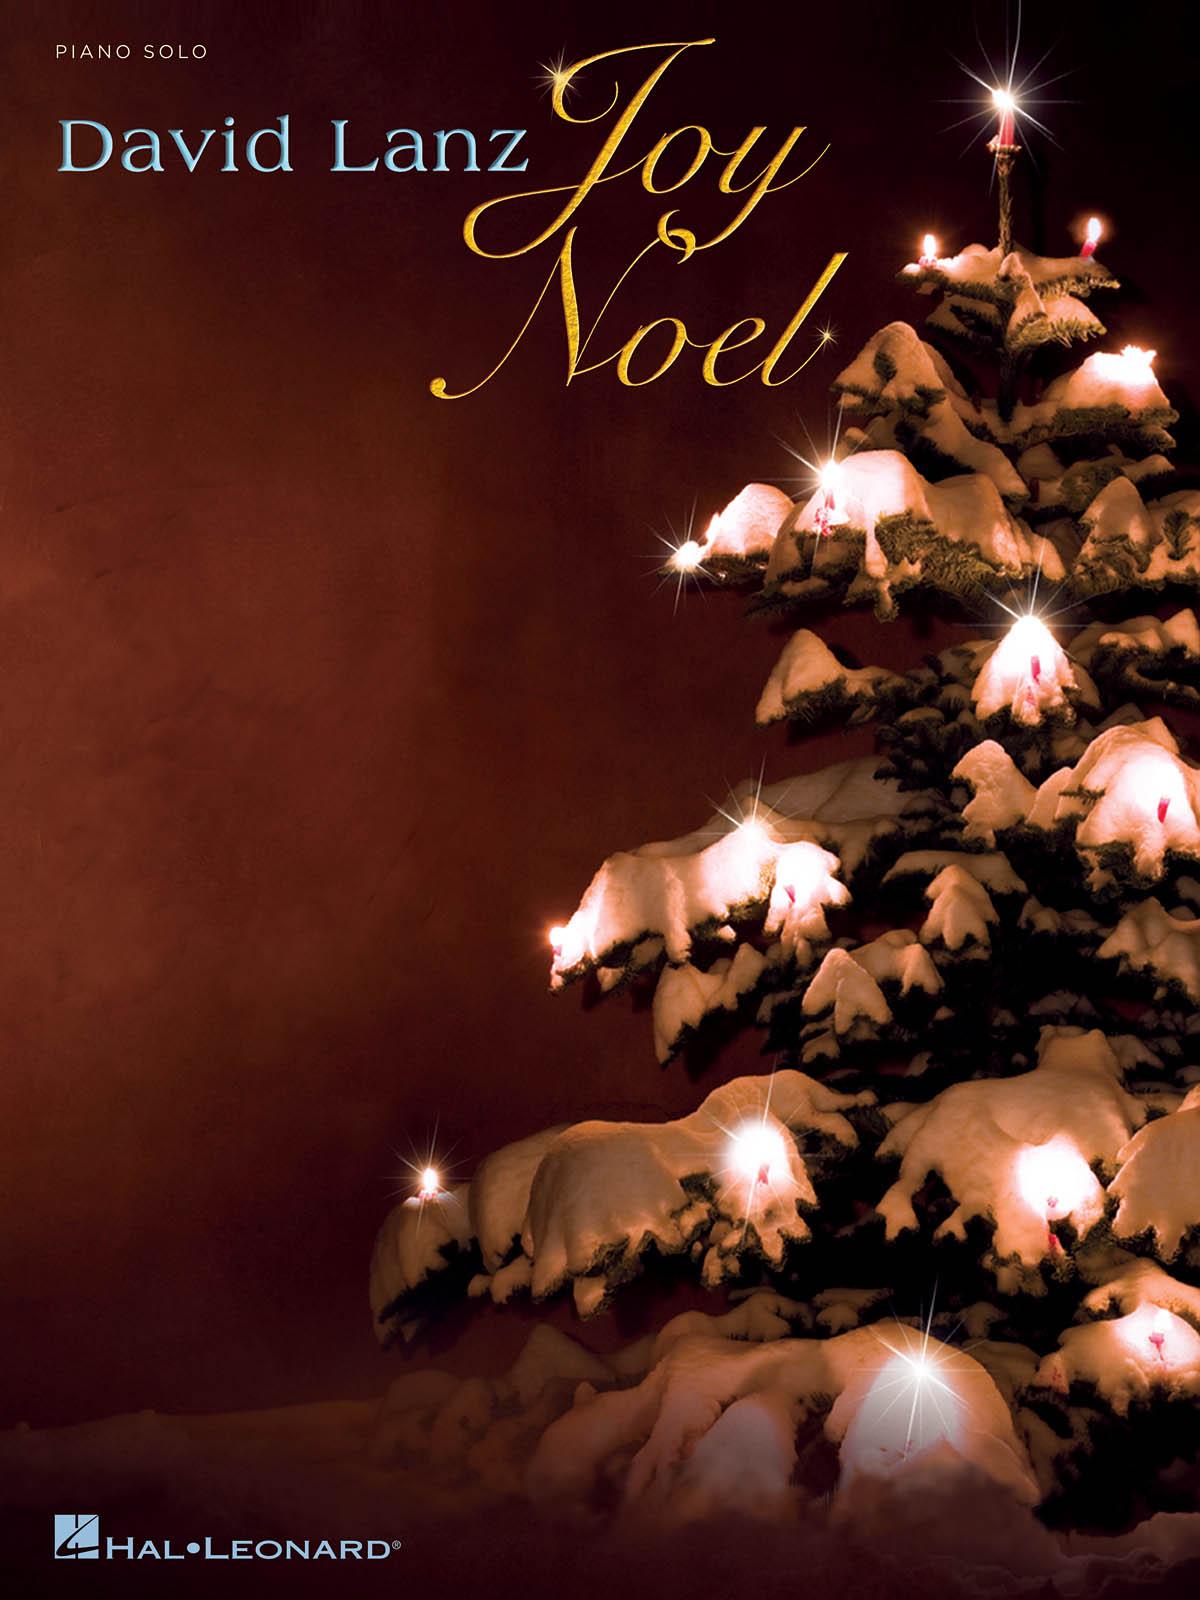 David Lanz: David Lanz - Joy Noel: Piano: Mixed Songbook